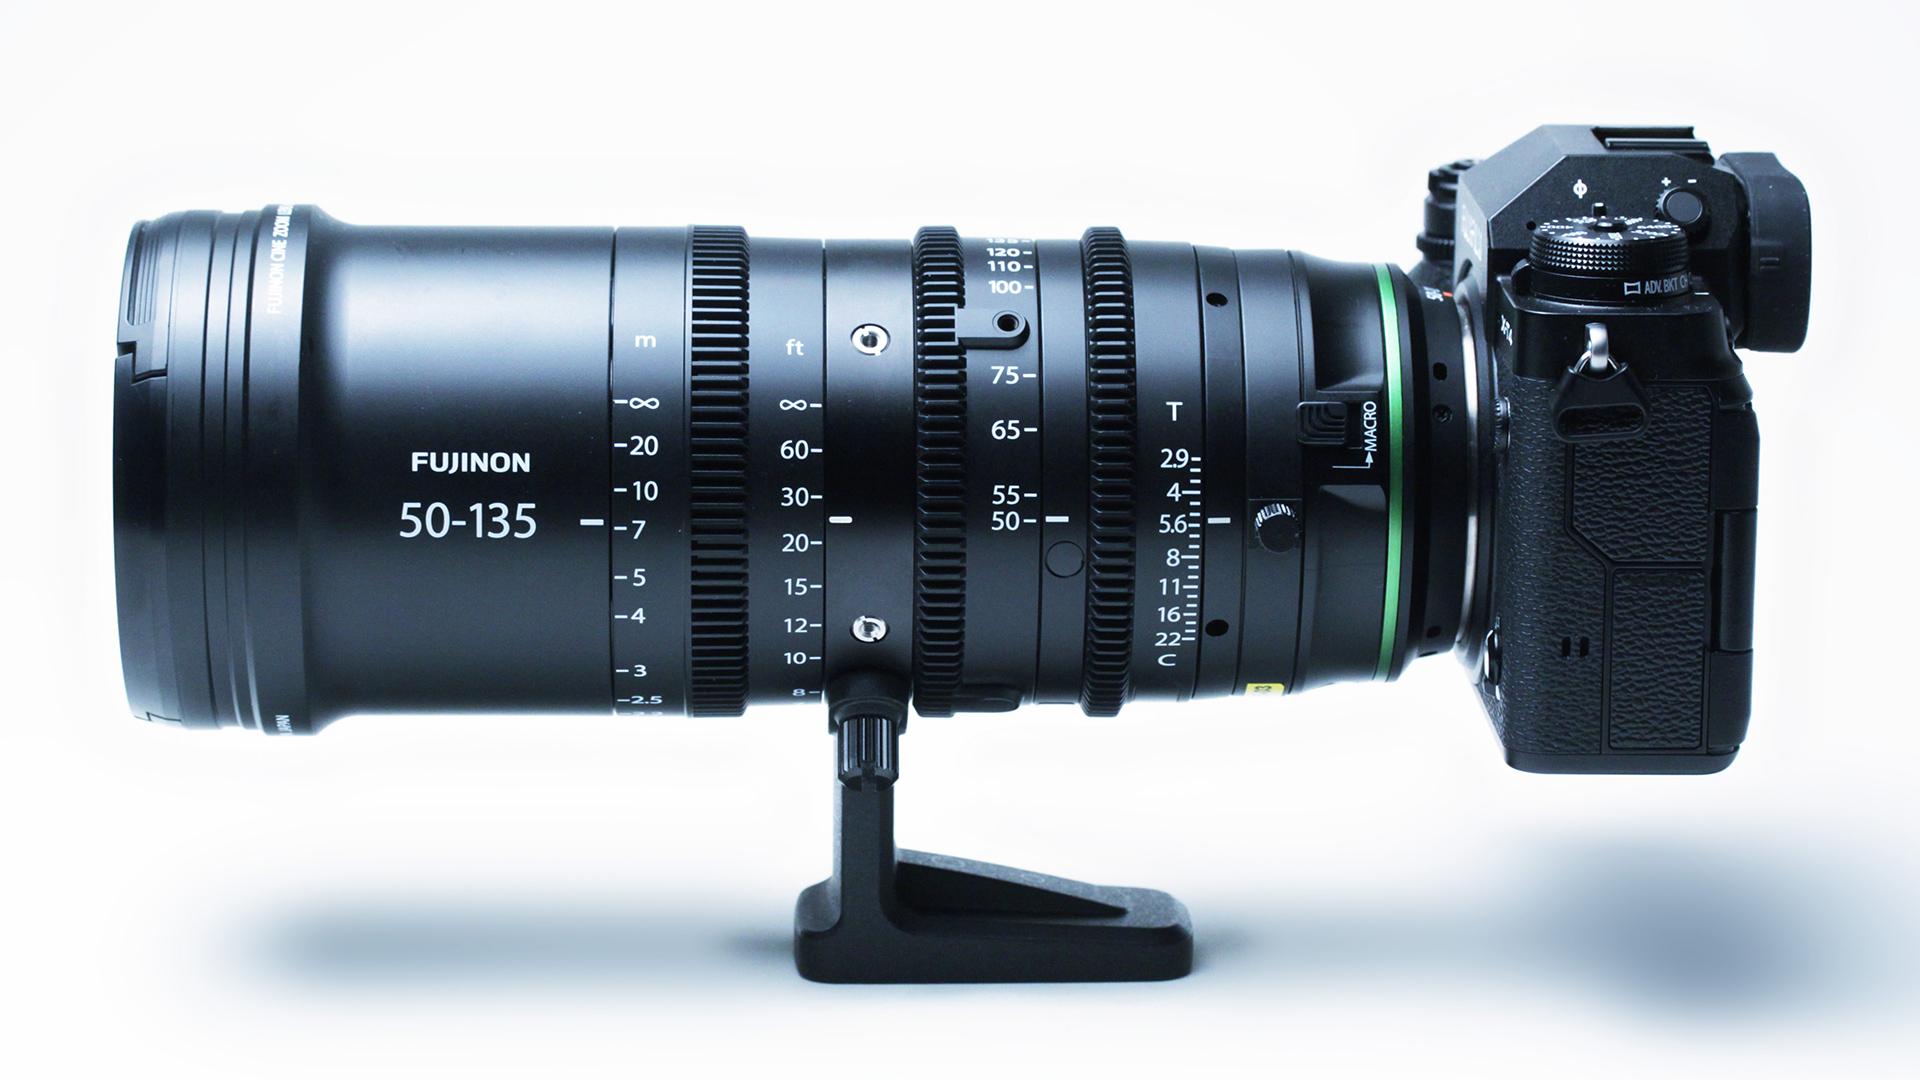 Fujifilm X-T4 with Fujinon MK50-135mm.